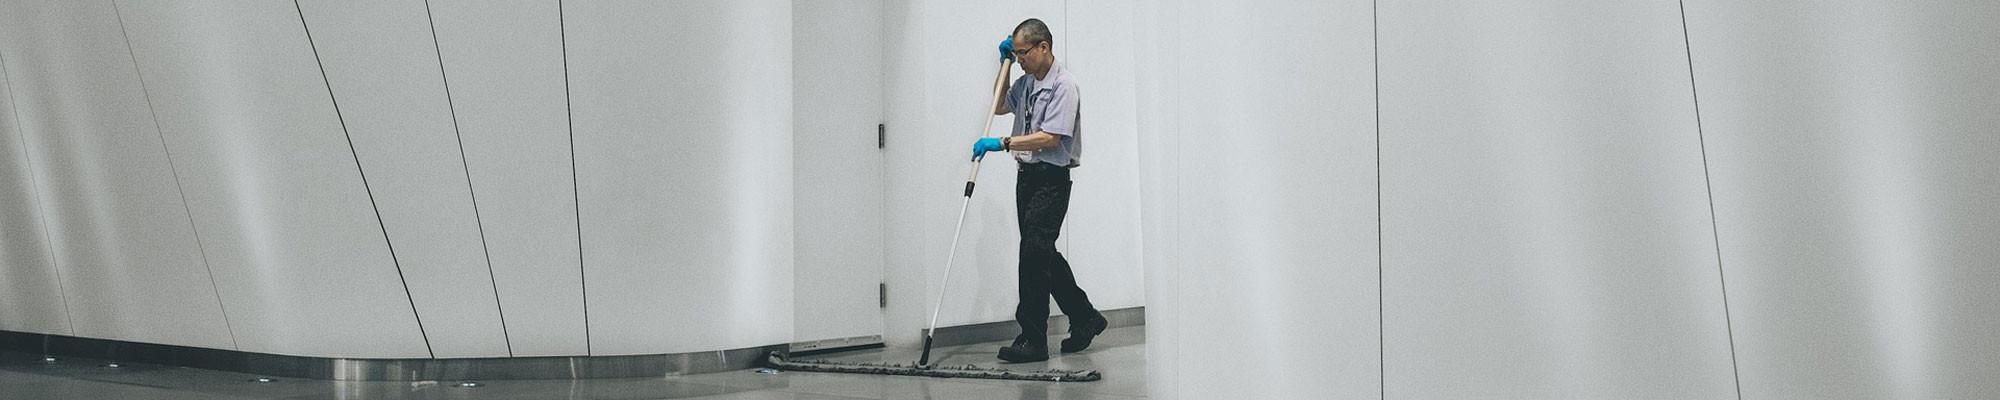 Clean Advisor